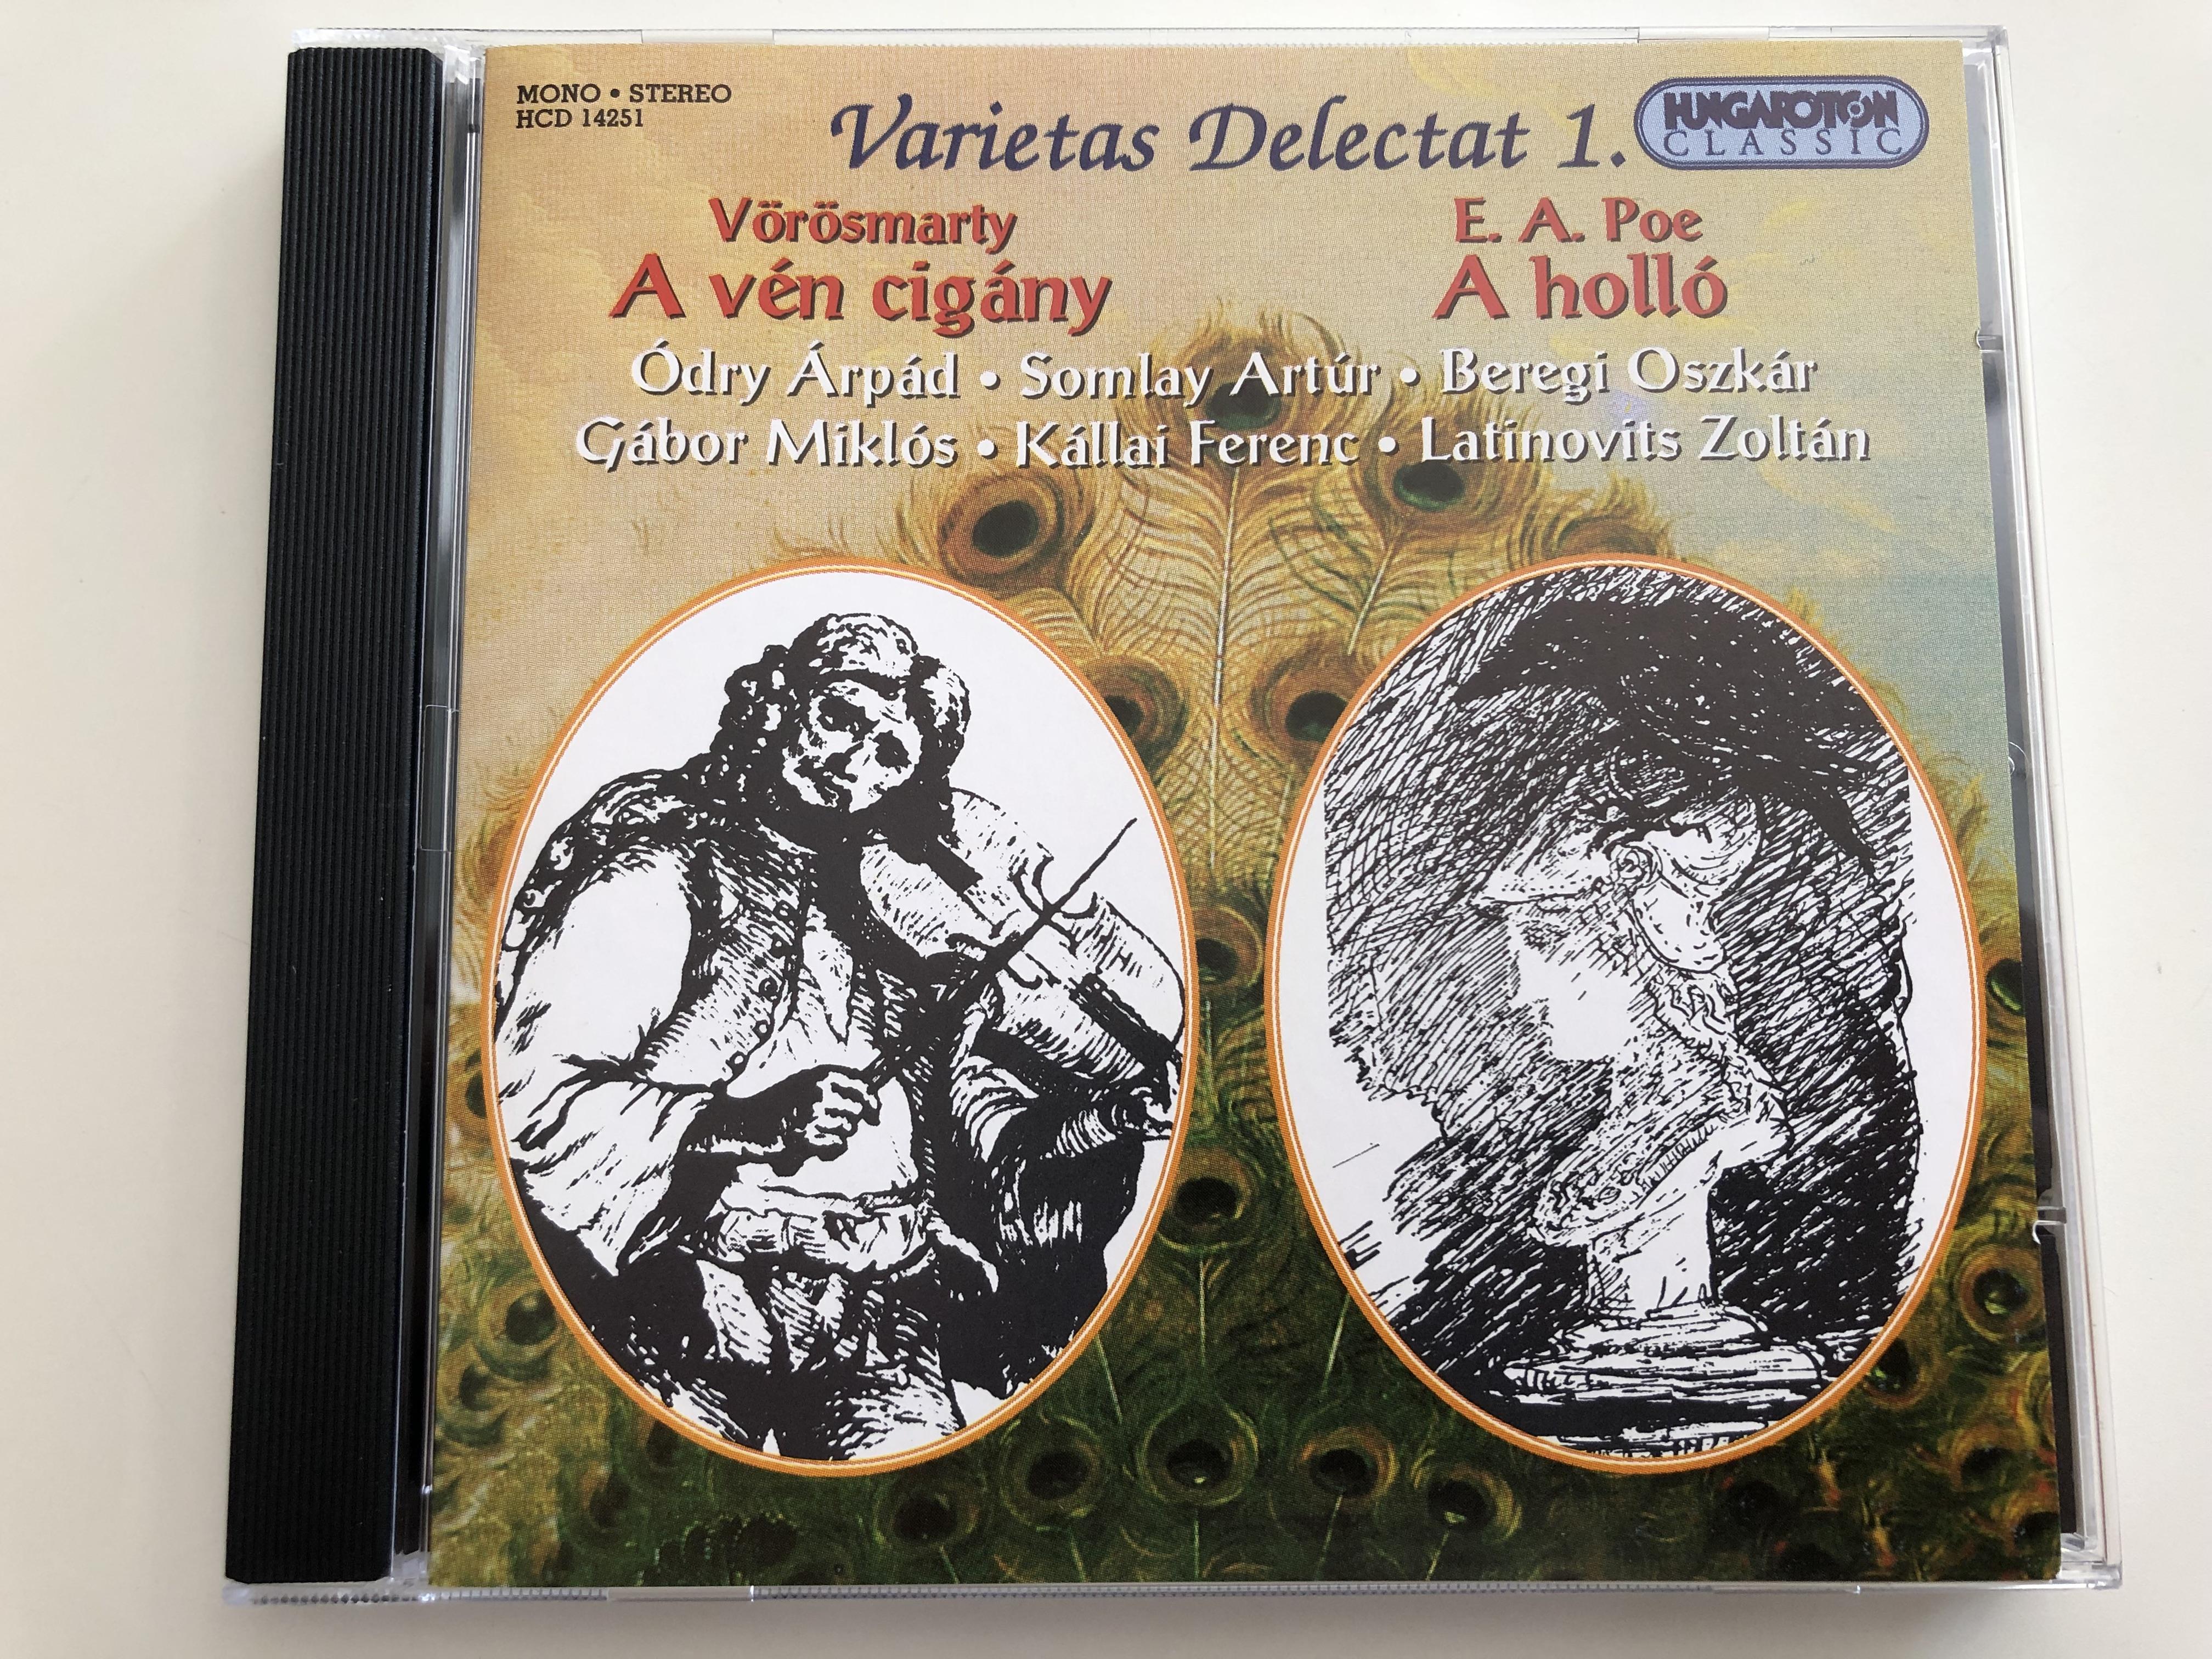 varietas-delectat-1.-v-r-smarty-a-v-n-cig-ny-e.-a.-poe-a-holl-dry-rp-d-somlay-art-r-beregi-oszk-r-g-bor-mikl-s-k-llai-ferenc-latinovits-zolt-n-hungaroton-classic-audio-cd-1997-hcd-14251-1-.jpg